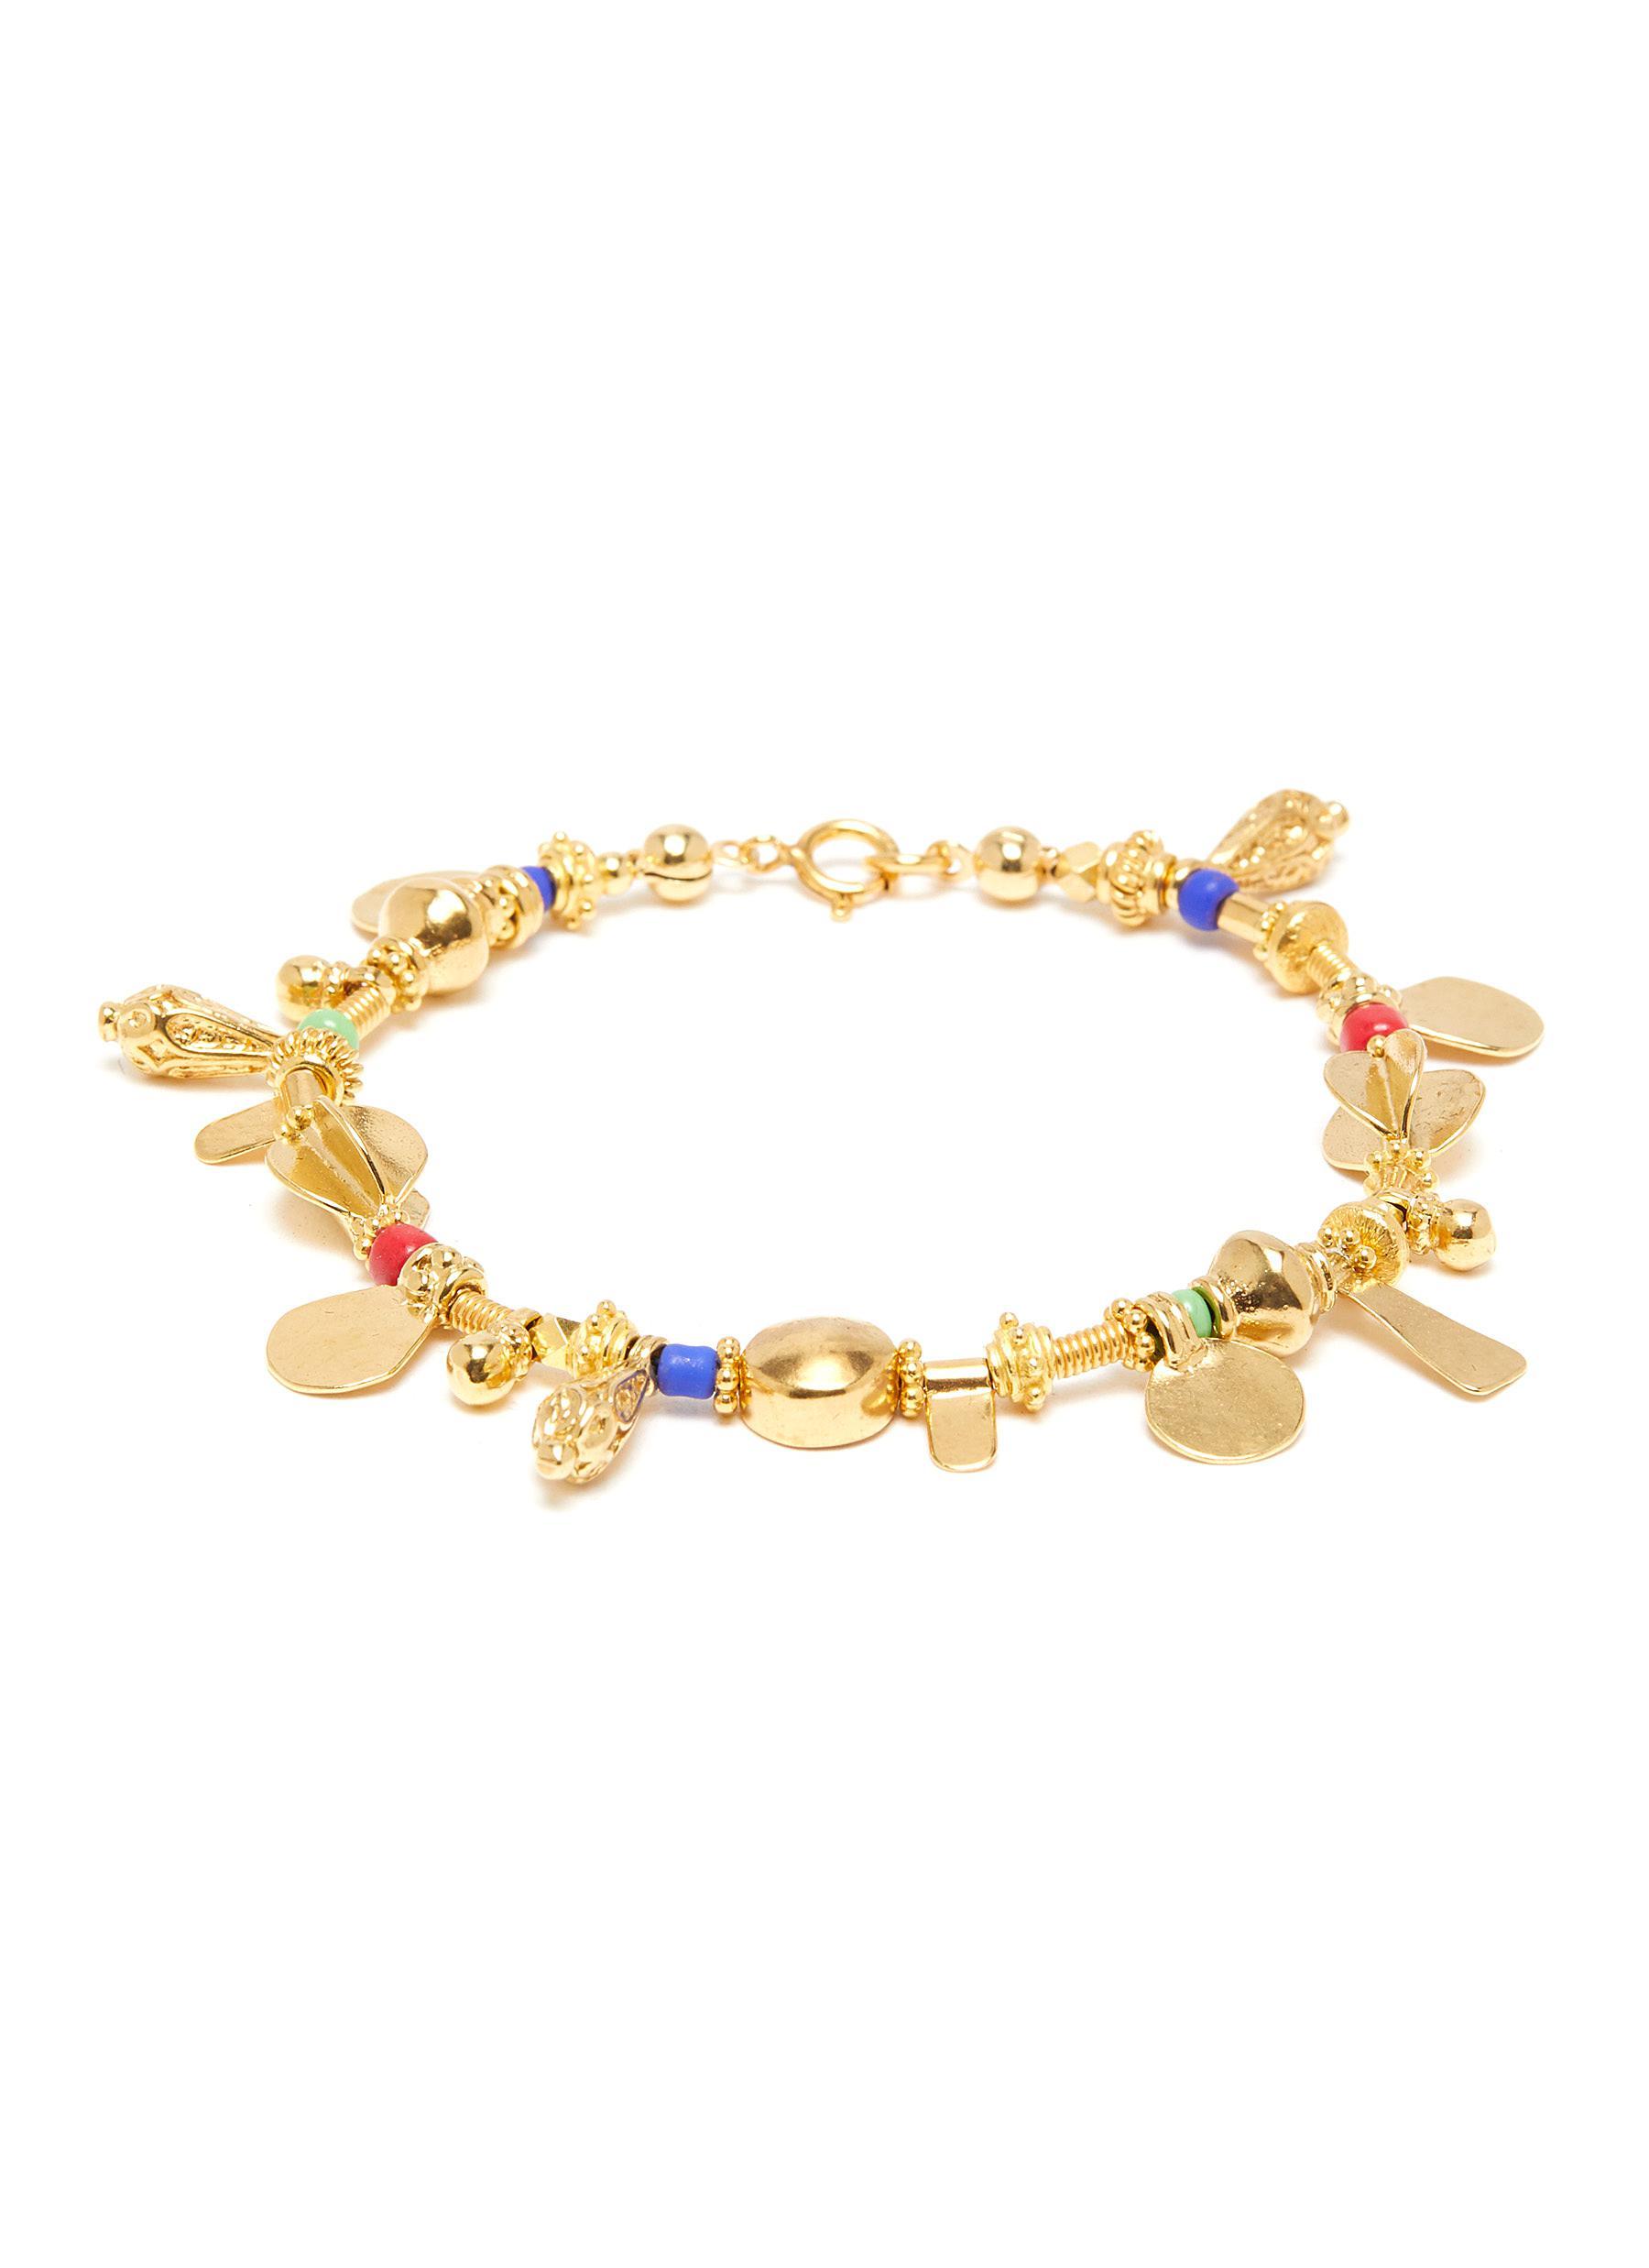 'Fairy's tail' 24k gold plated silver bronze vermeil bracelet